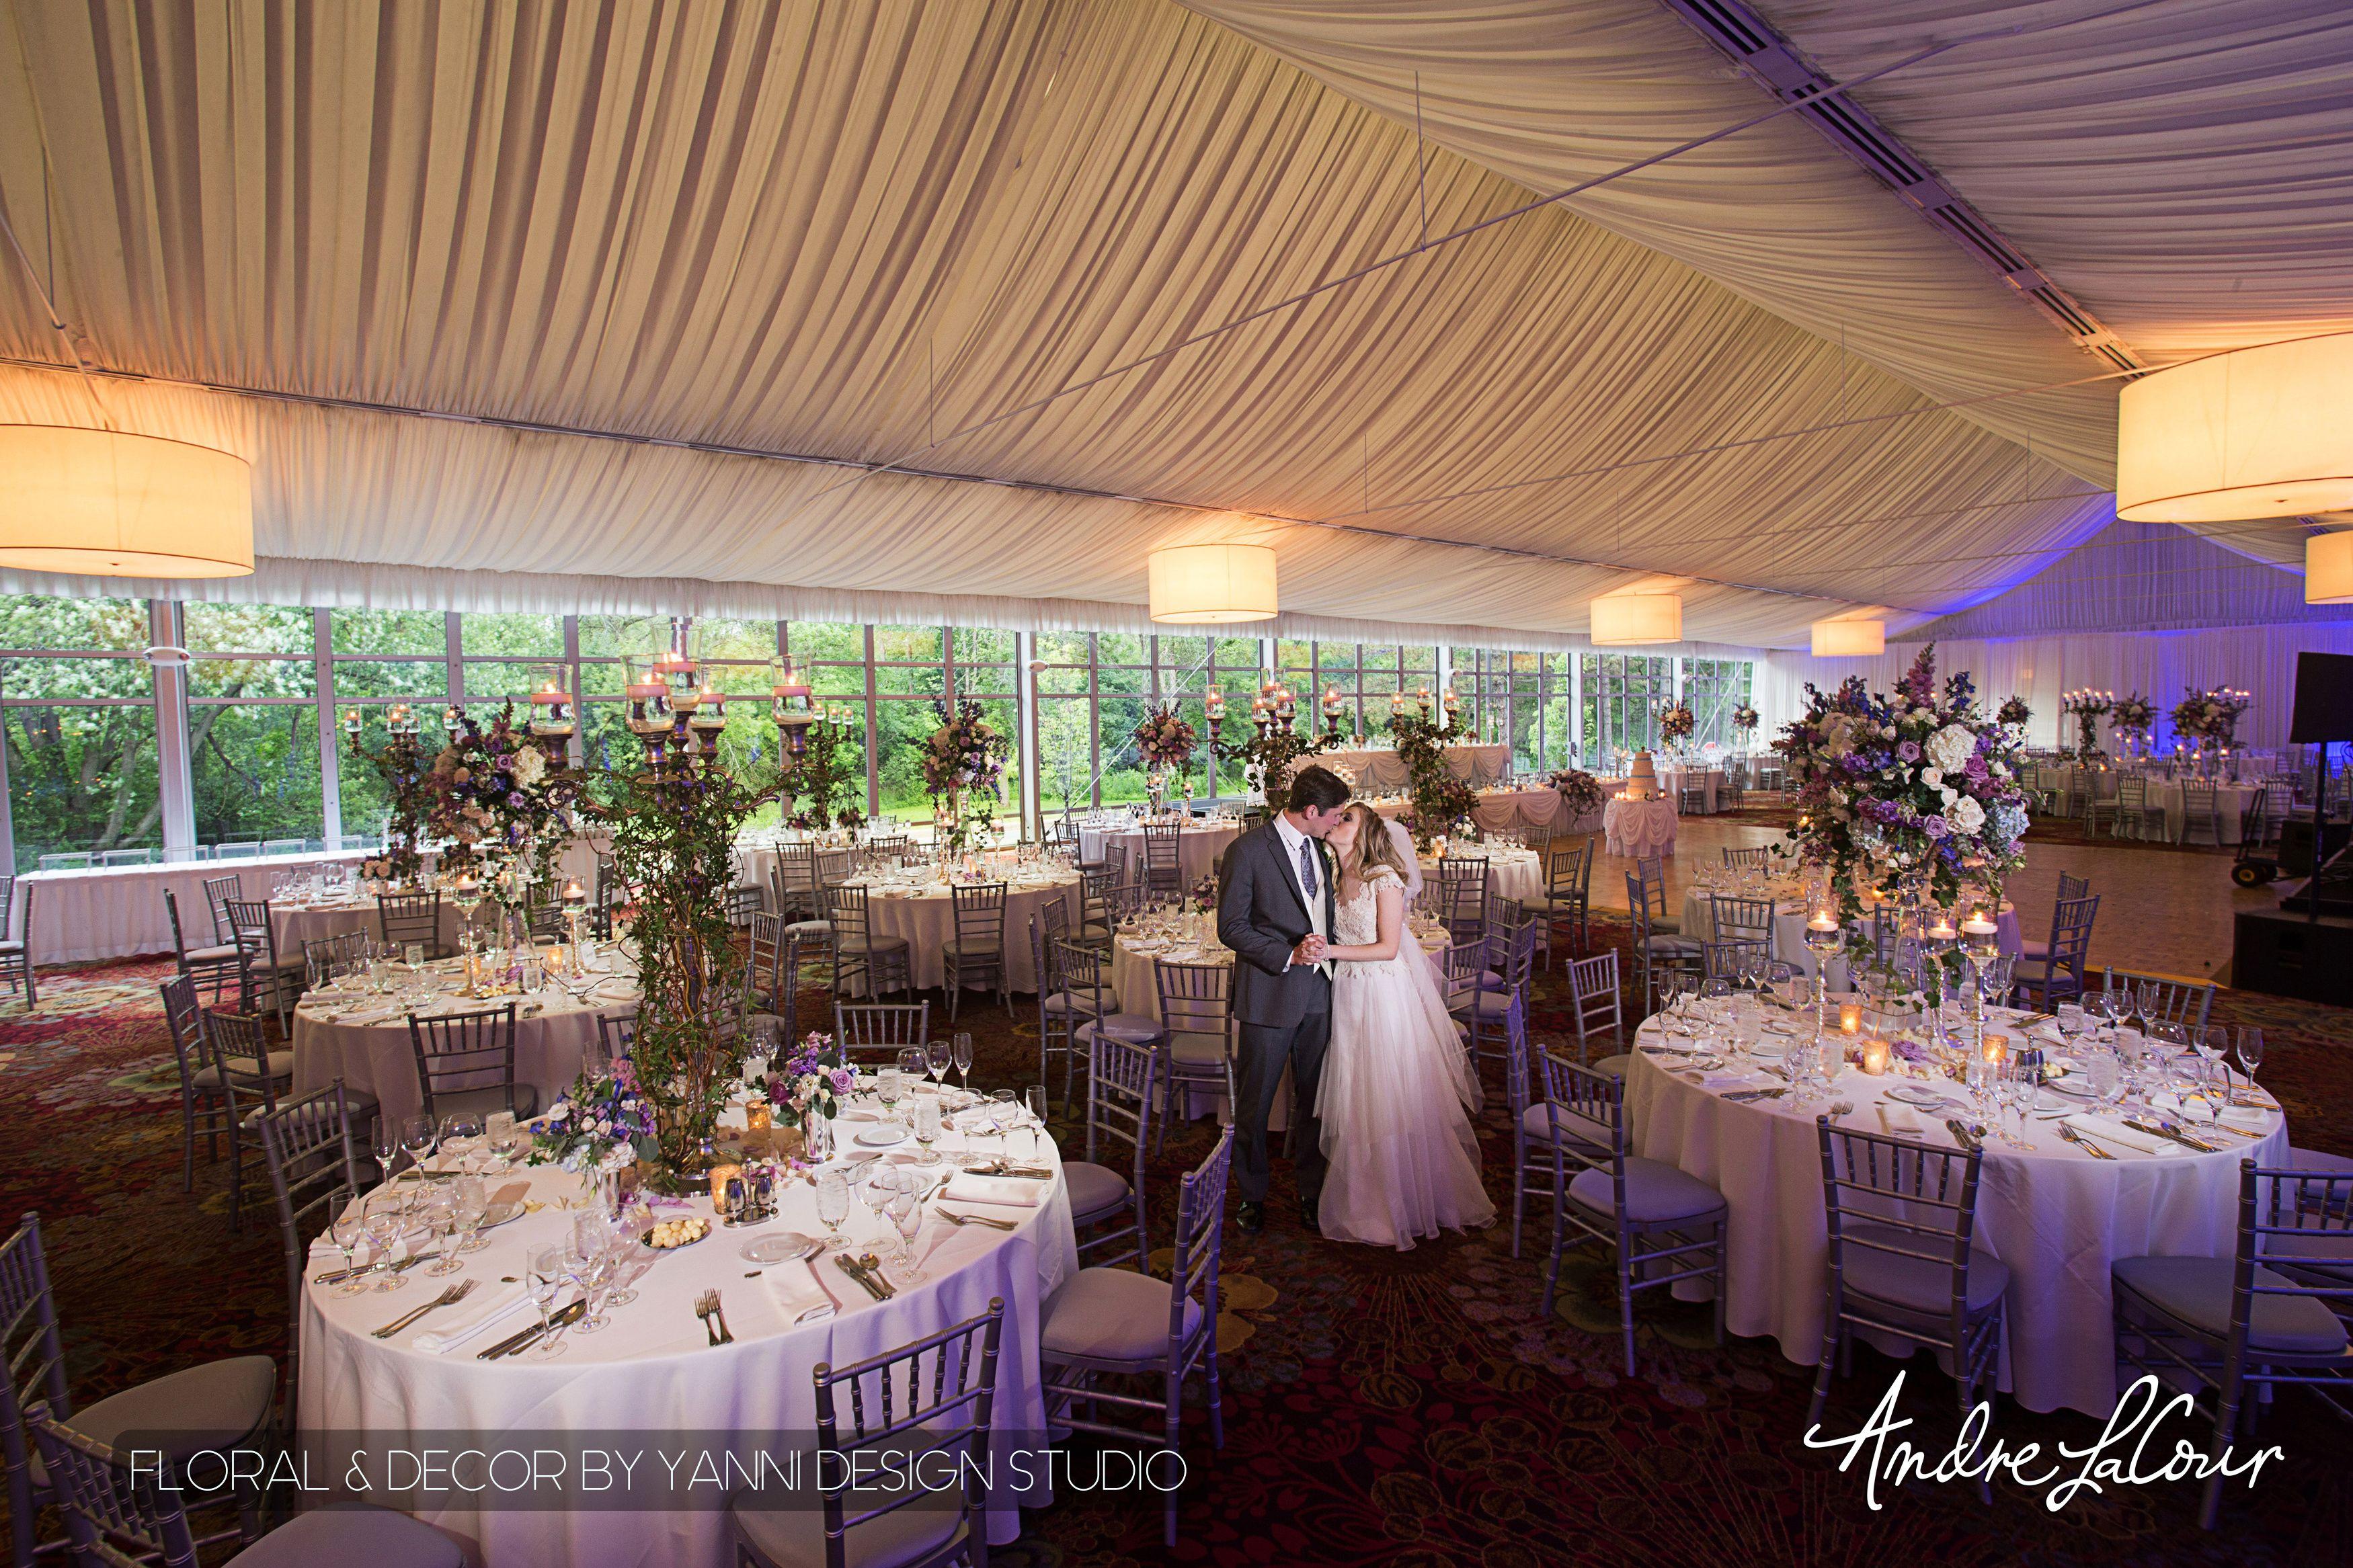 14 best marriott lincolnshire hotel wedding decor images on 14 best marriott lincolnshire hotel wedding decor images on pinterest hotel wedding wedding decor and celebrity weddings junglespirit Gallery